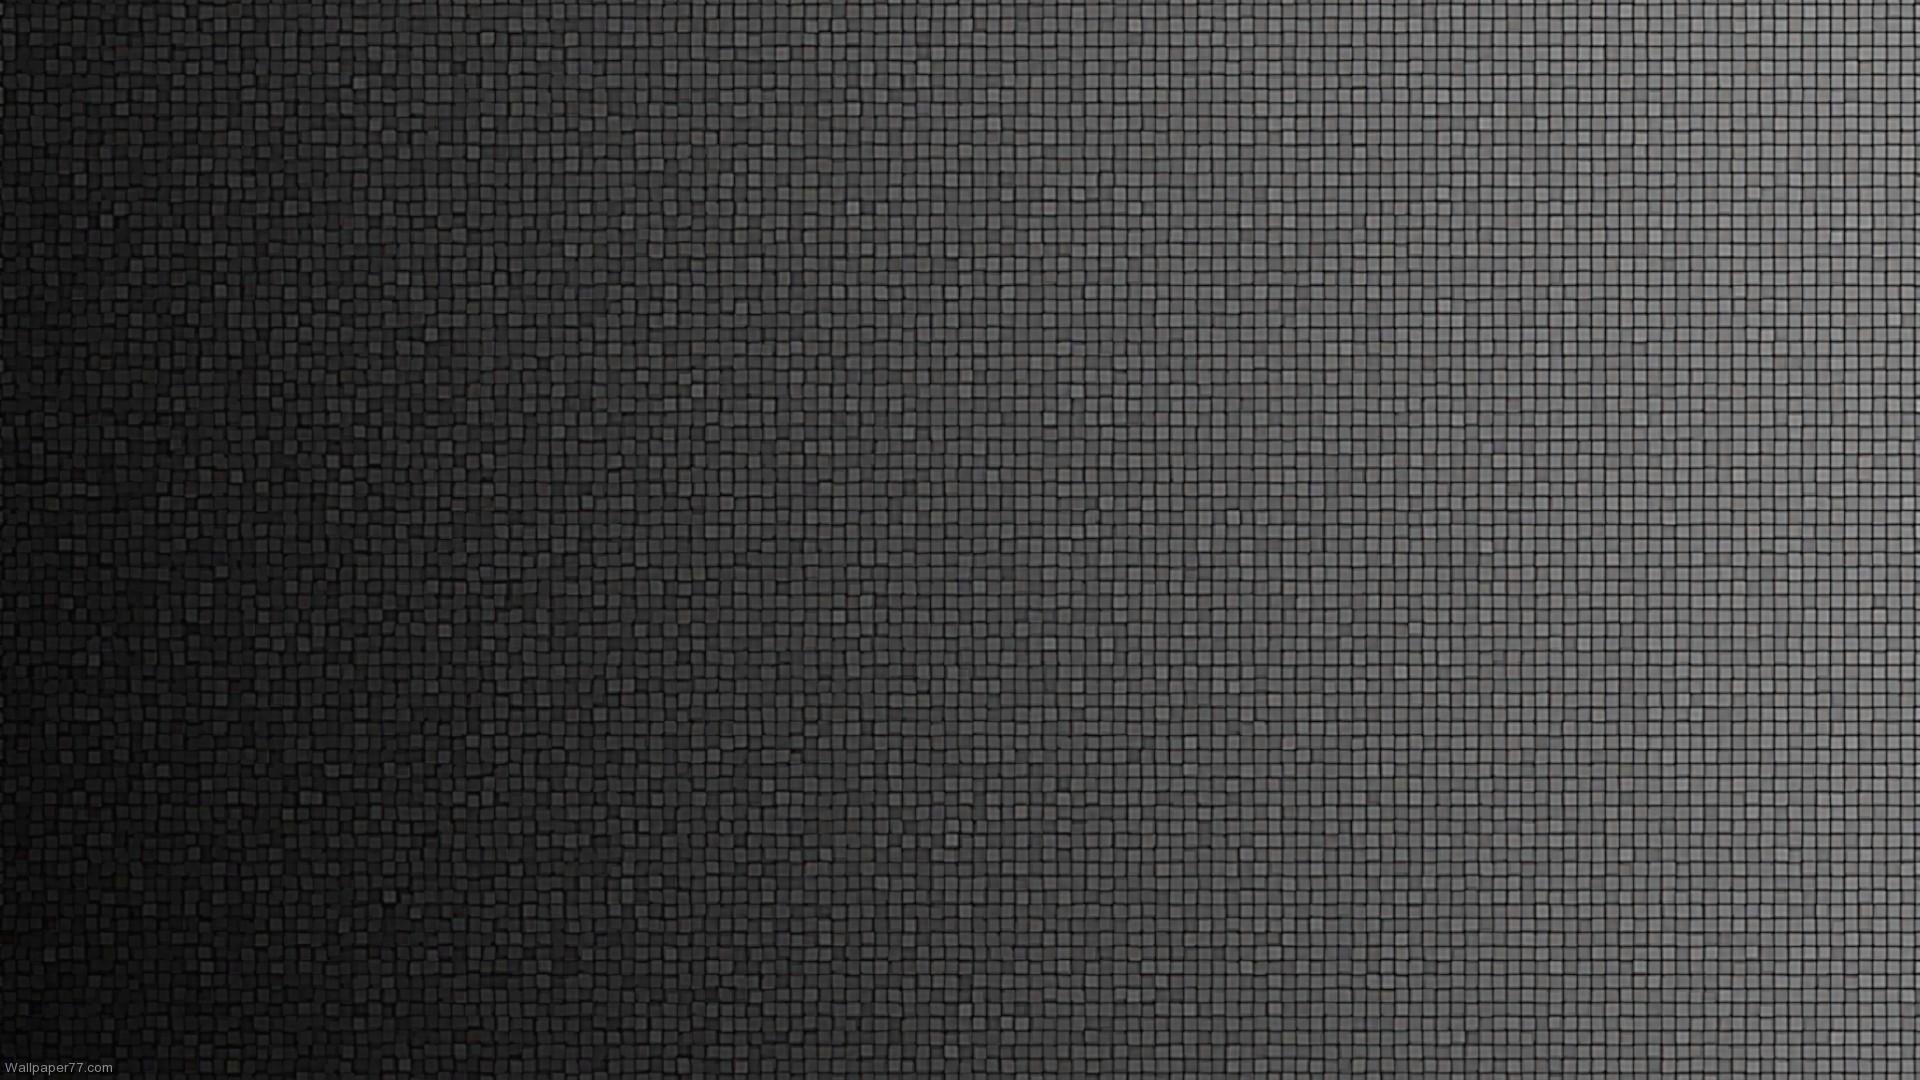 ipad-3-wallpaper-ipad-wallpaper-retina-display-wallpaper-the-new ...